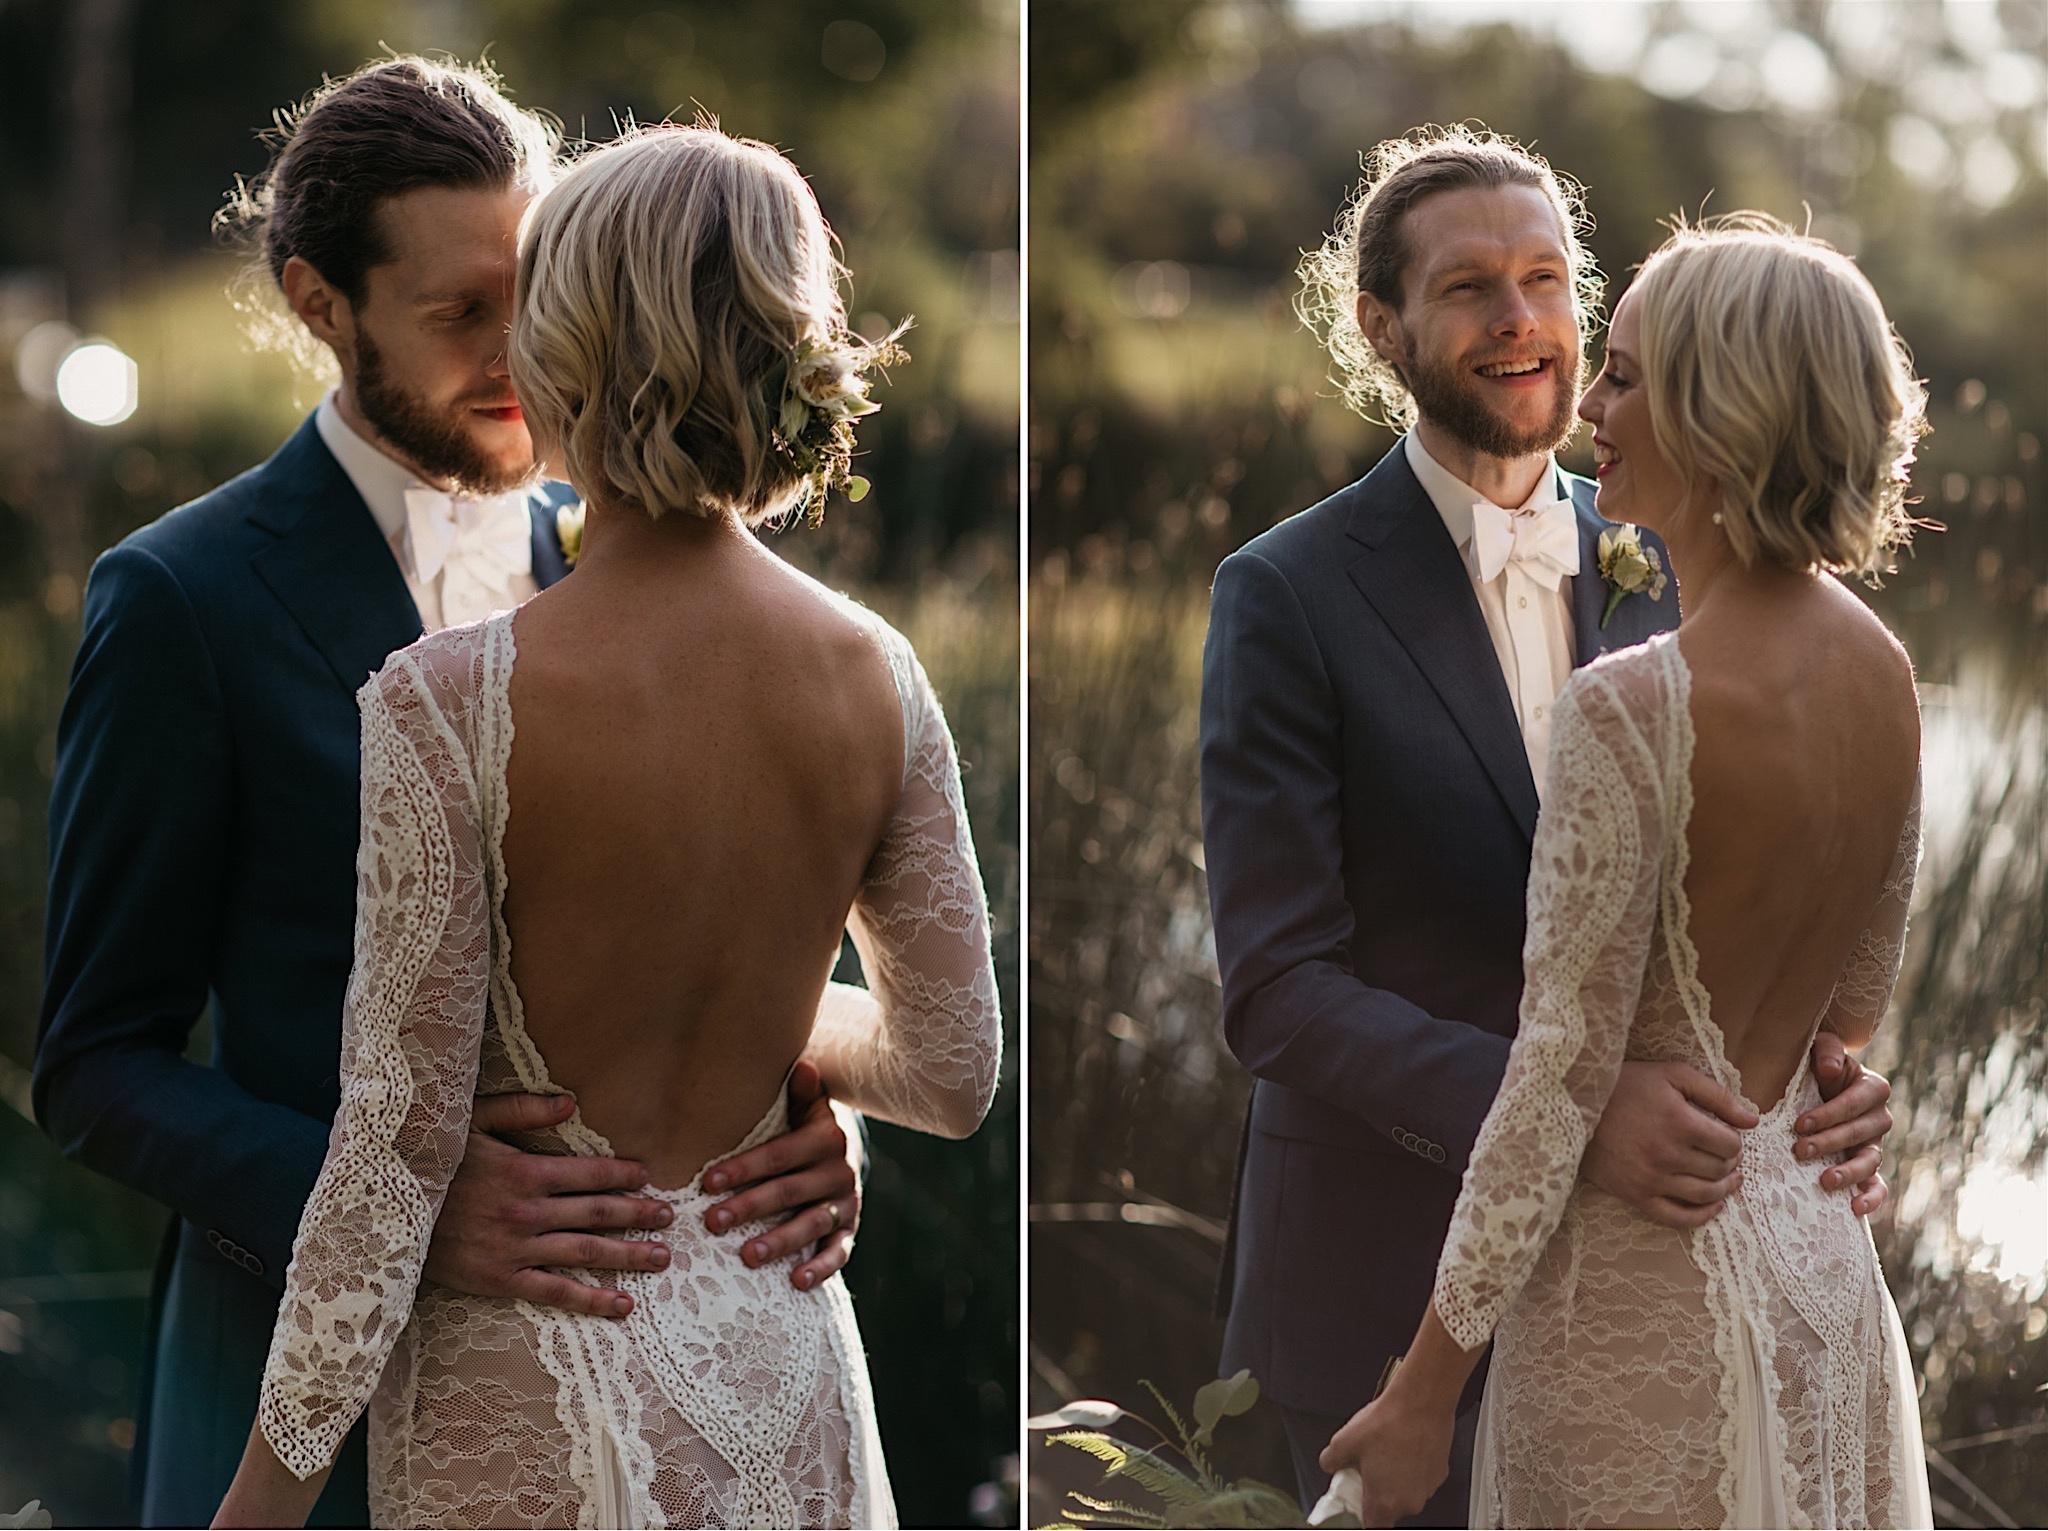 064_SBA-Jen-Tom-Wedding-258_SBA-Jen-Tom-Wedding-251.jpg